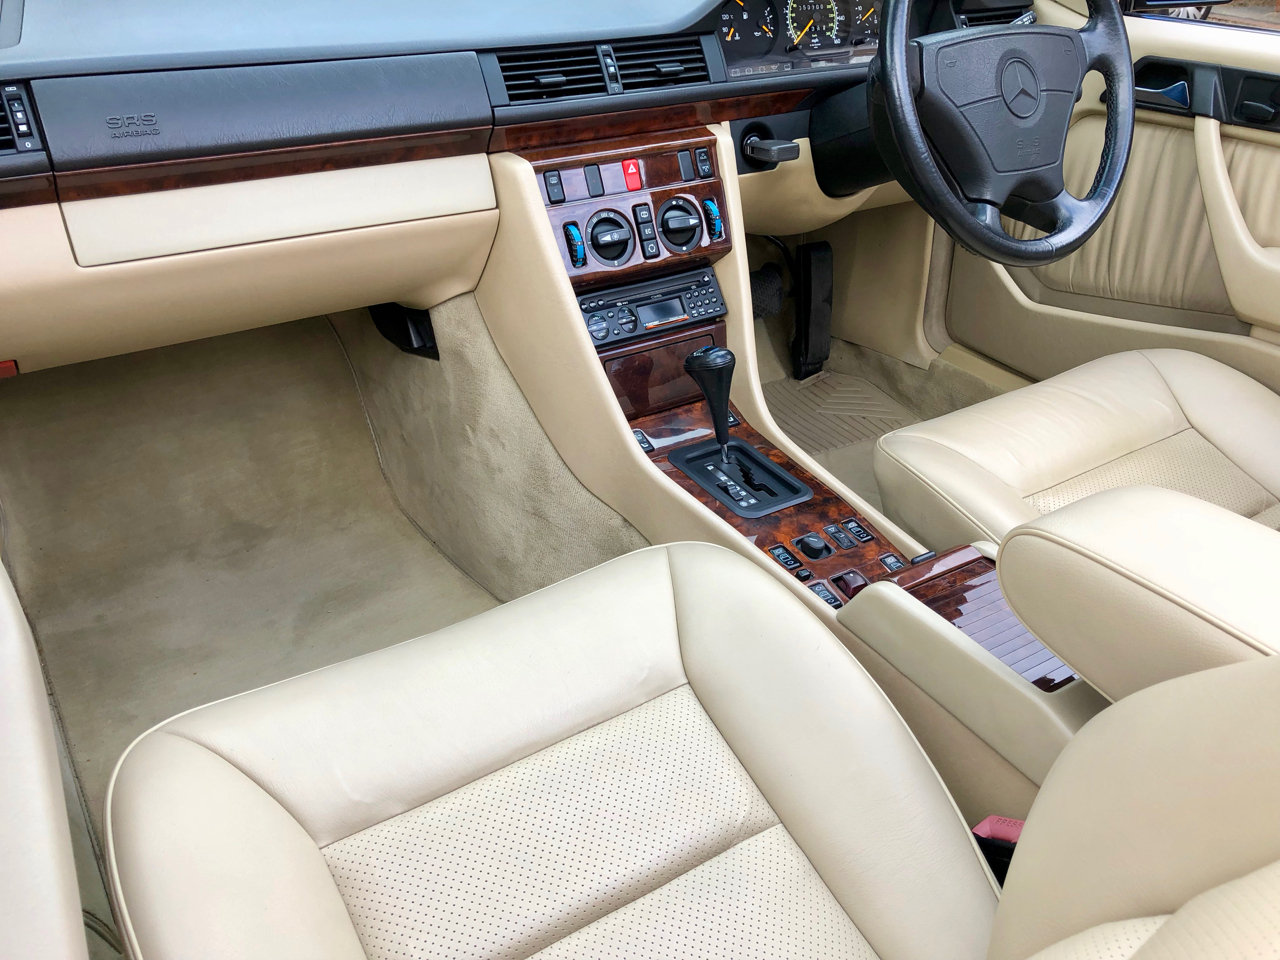 1993/L - Mercedes 320CE Cabriolet Sportline. 53k. FSH. E320  For Sale (picture 4 of 6)